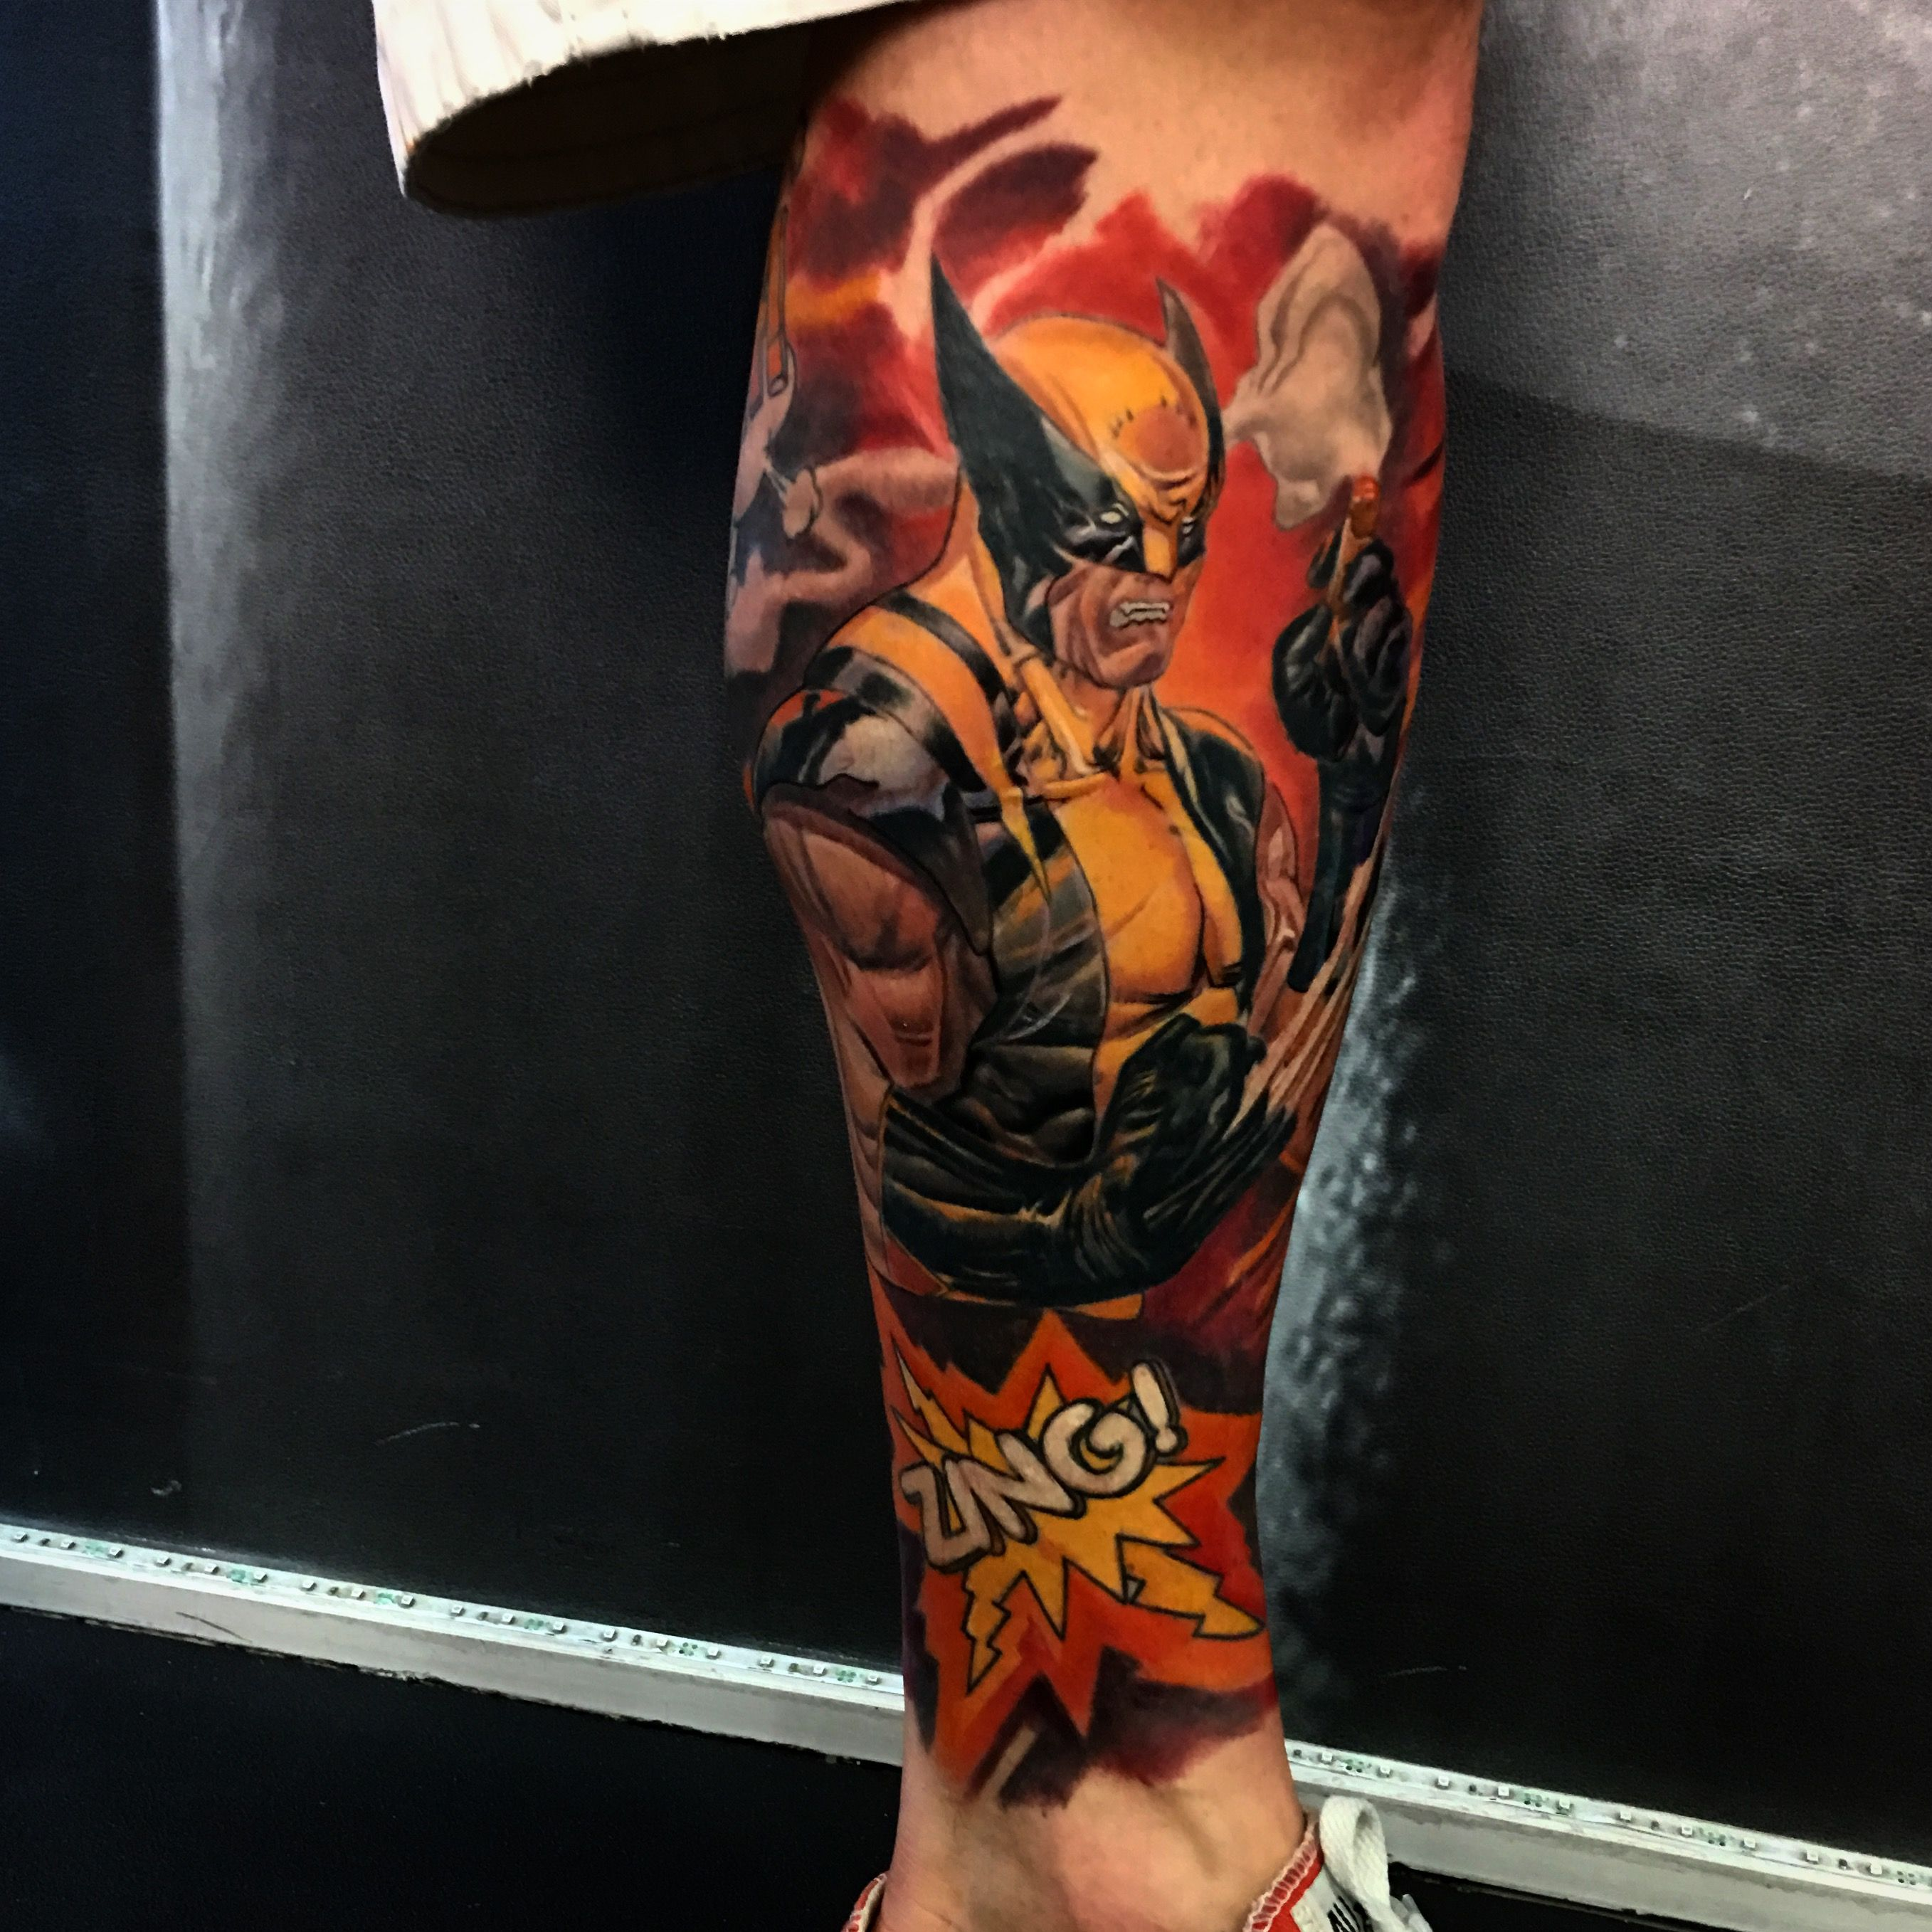 Wolverine wolverine #tattoo #cartoontattoo